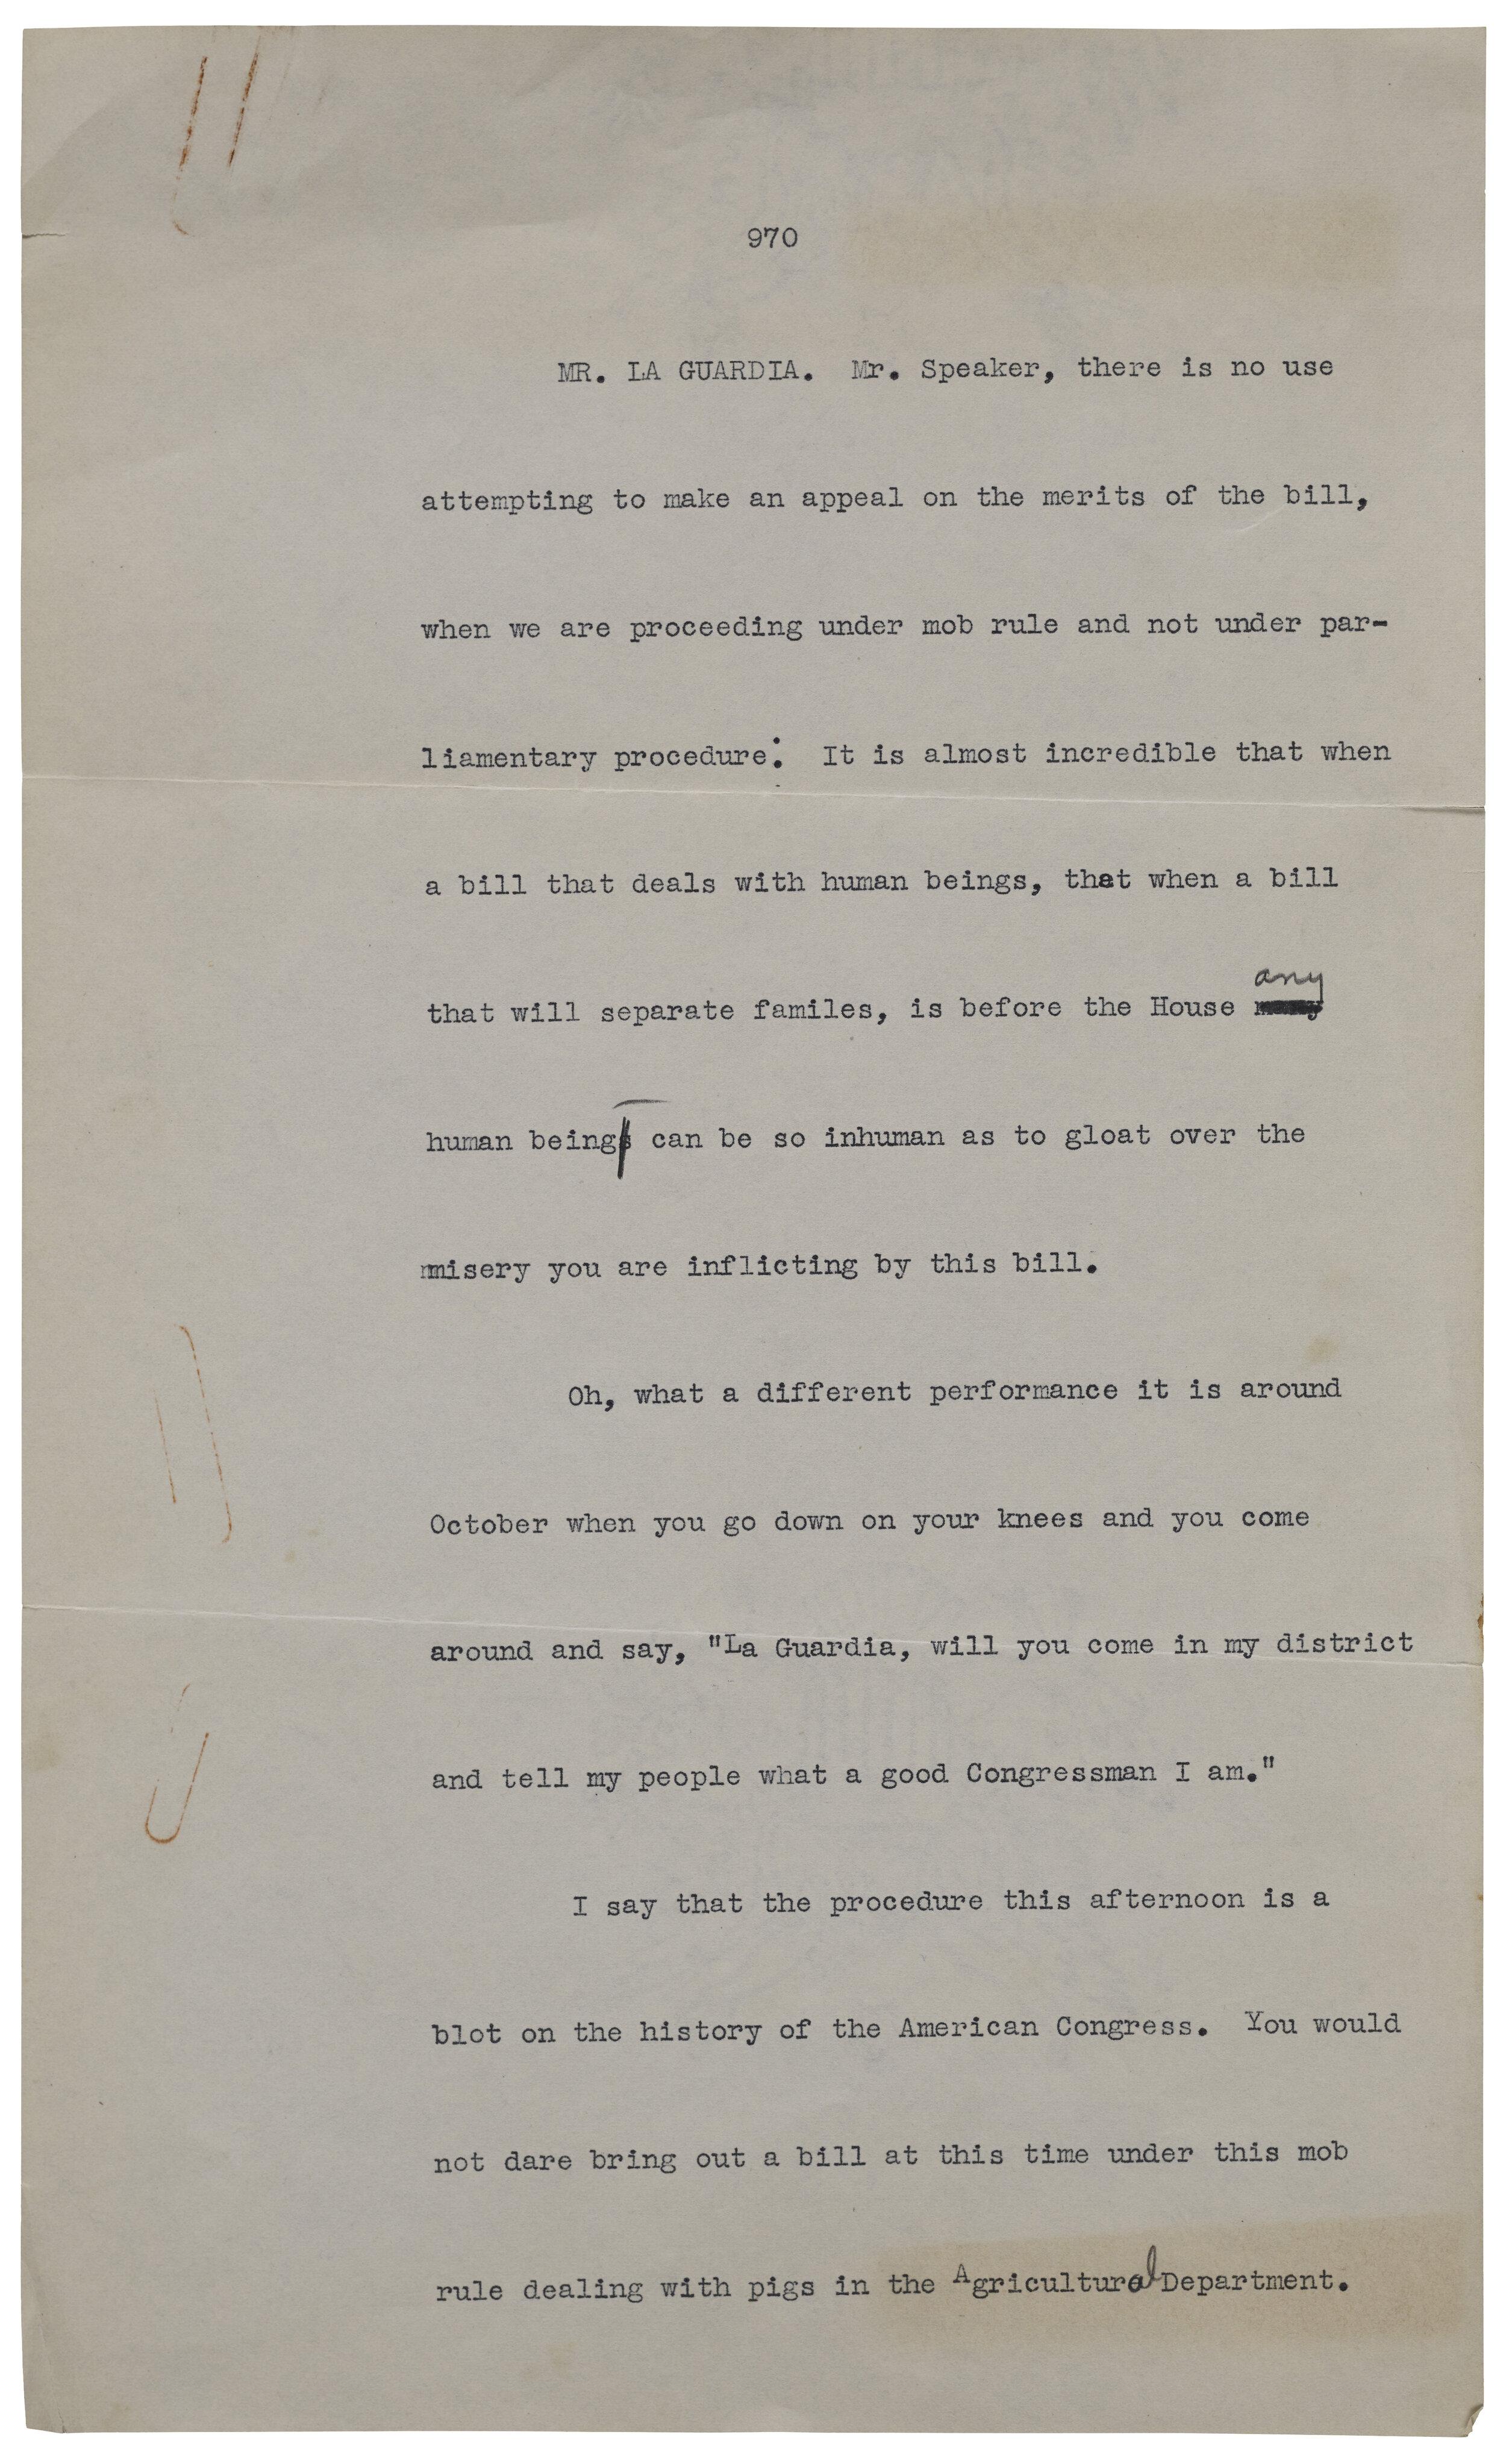 Fiorello LaGuardia Congressional testimony. Office of the Mayor, Mayor LaGuardia, Subject Files, NYC Municipal Archives.